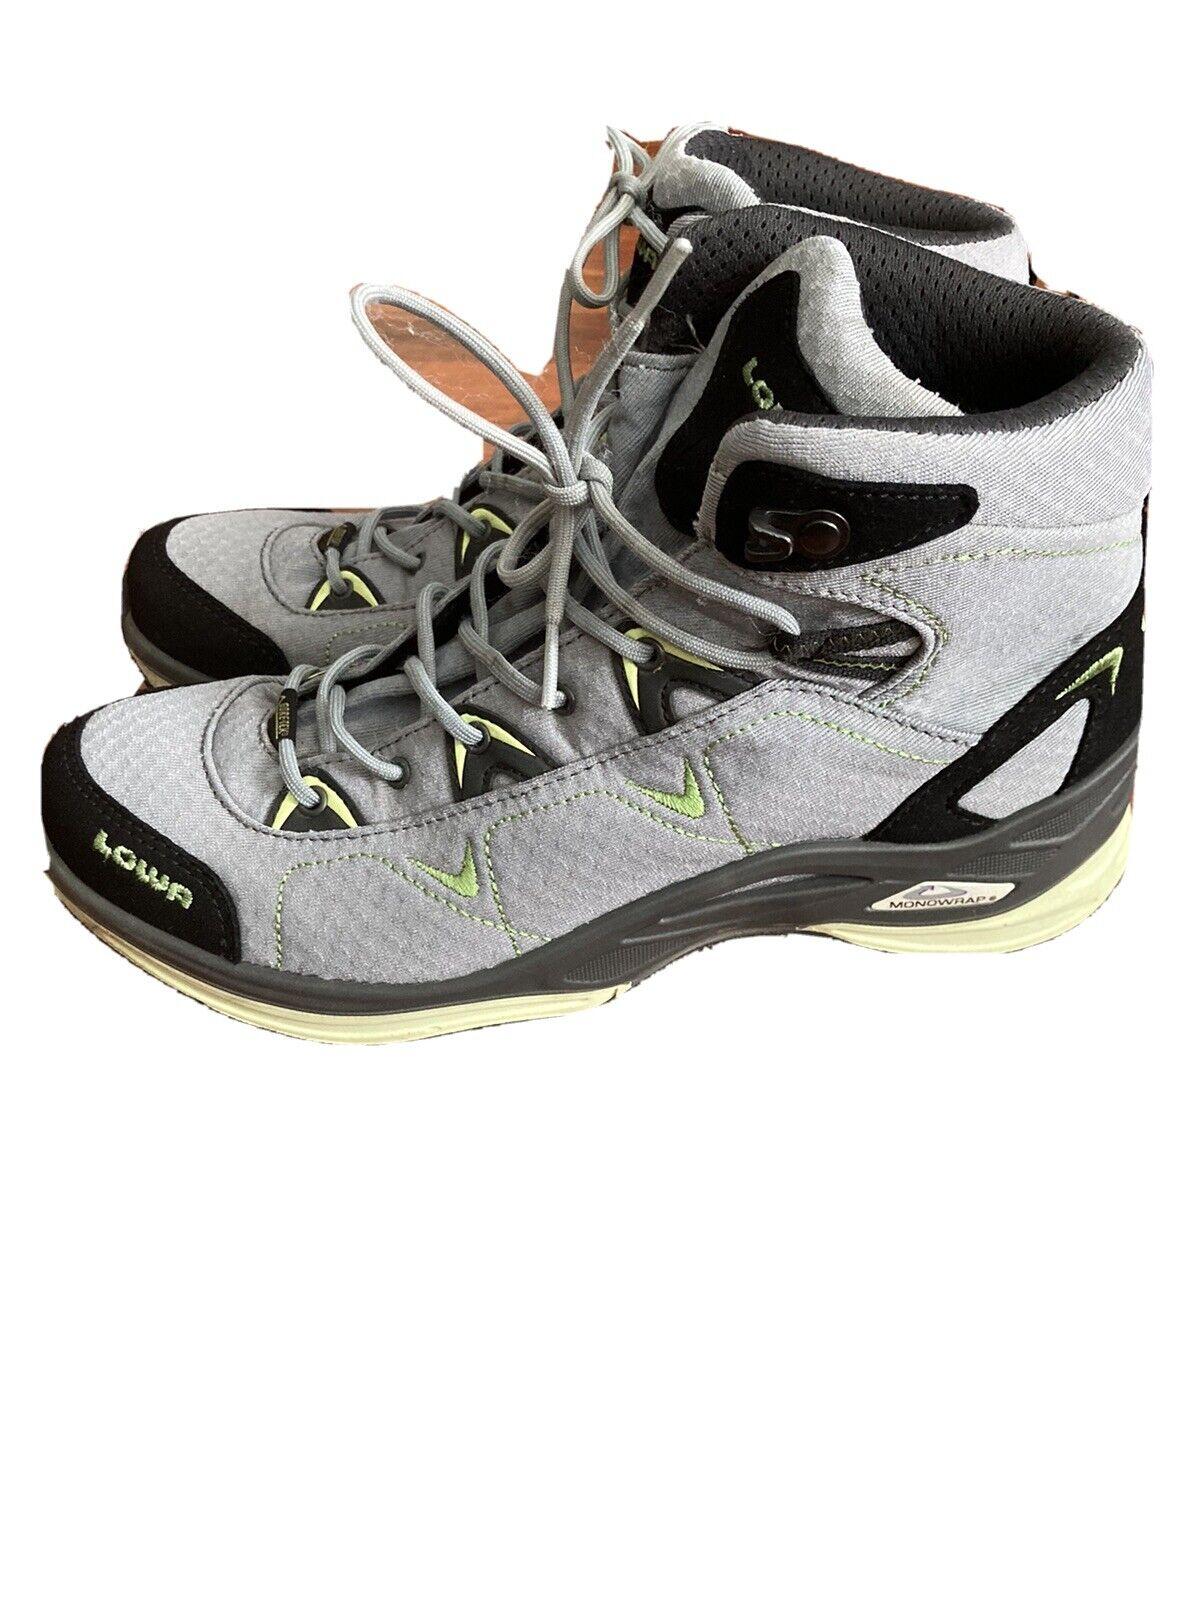 Women's Lowa Ferrox GTX Mid Gore-Tex Hiking Boots Size 7,5 Gray/Neon